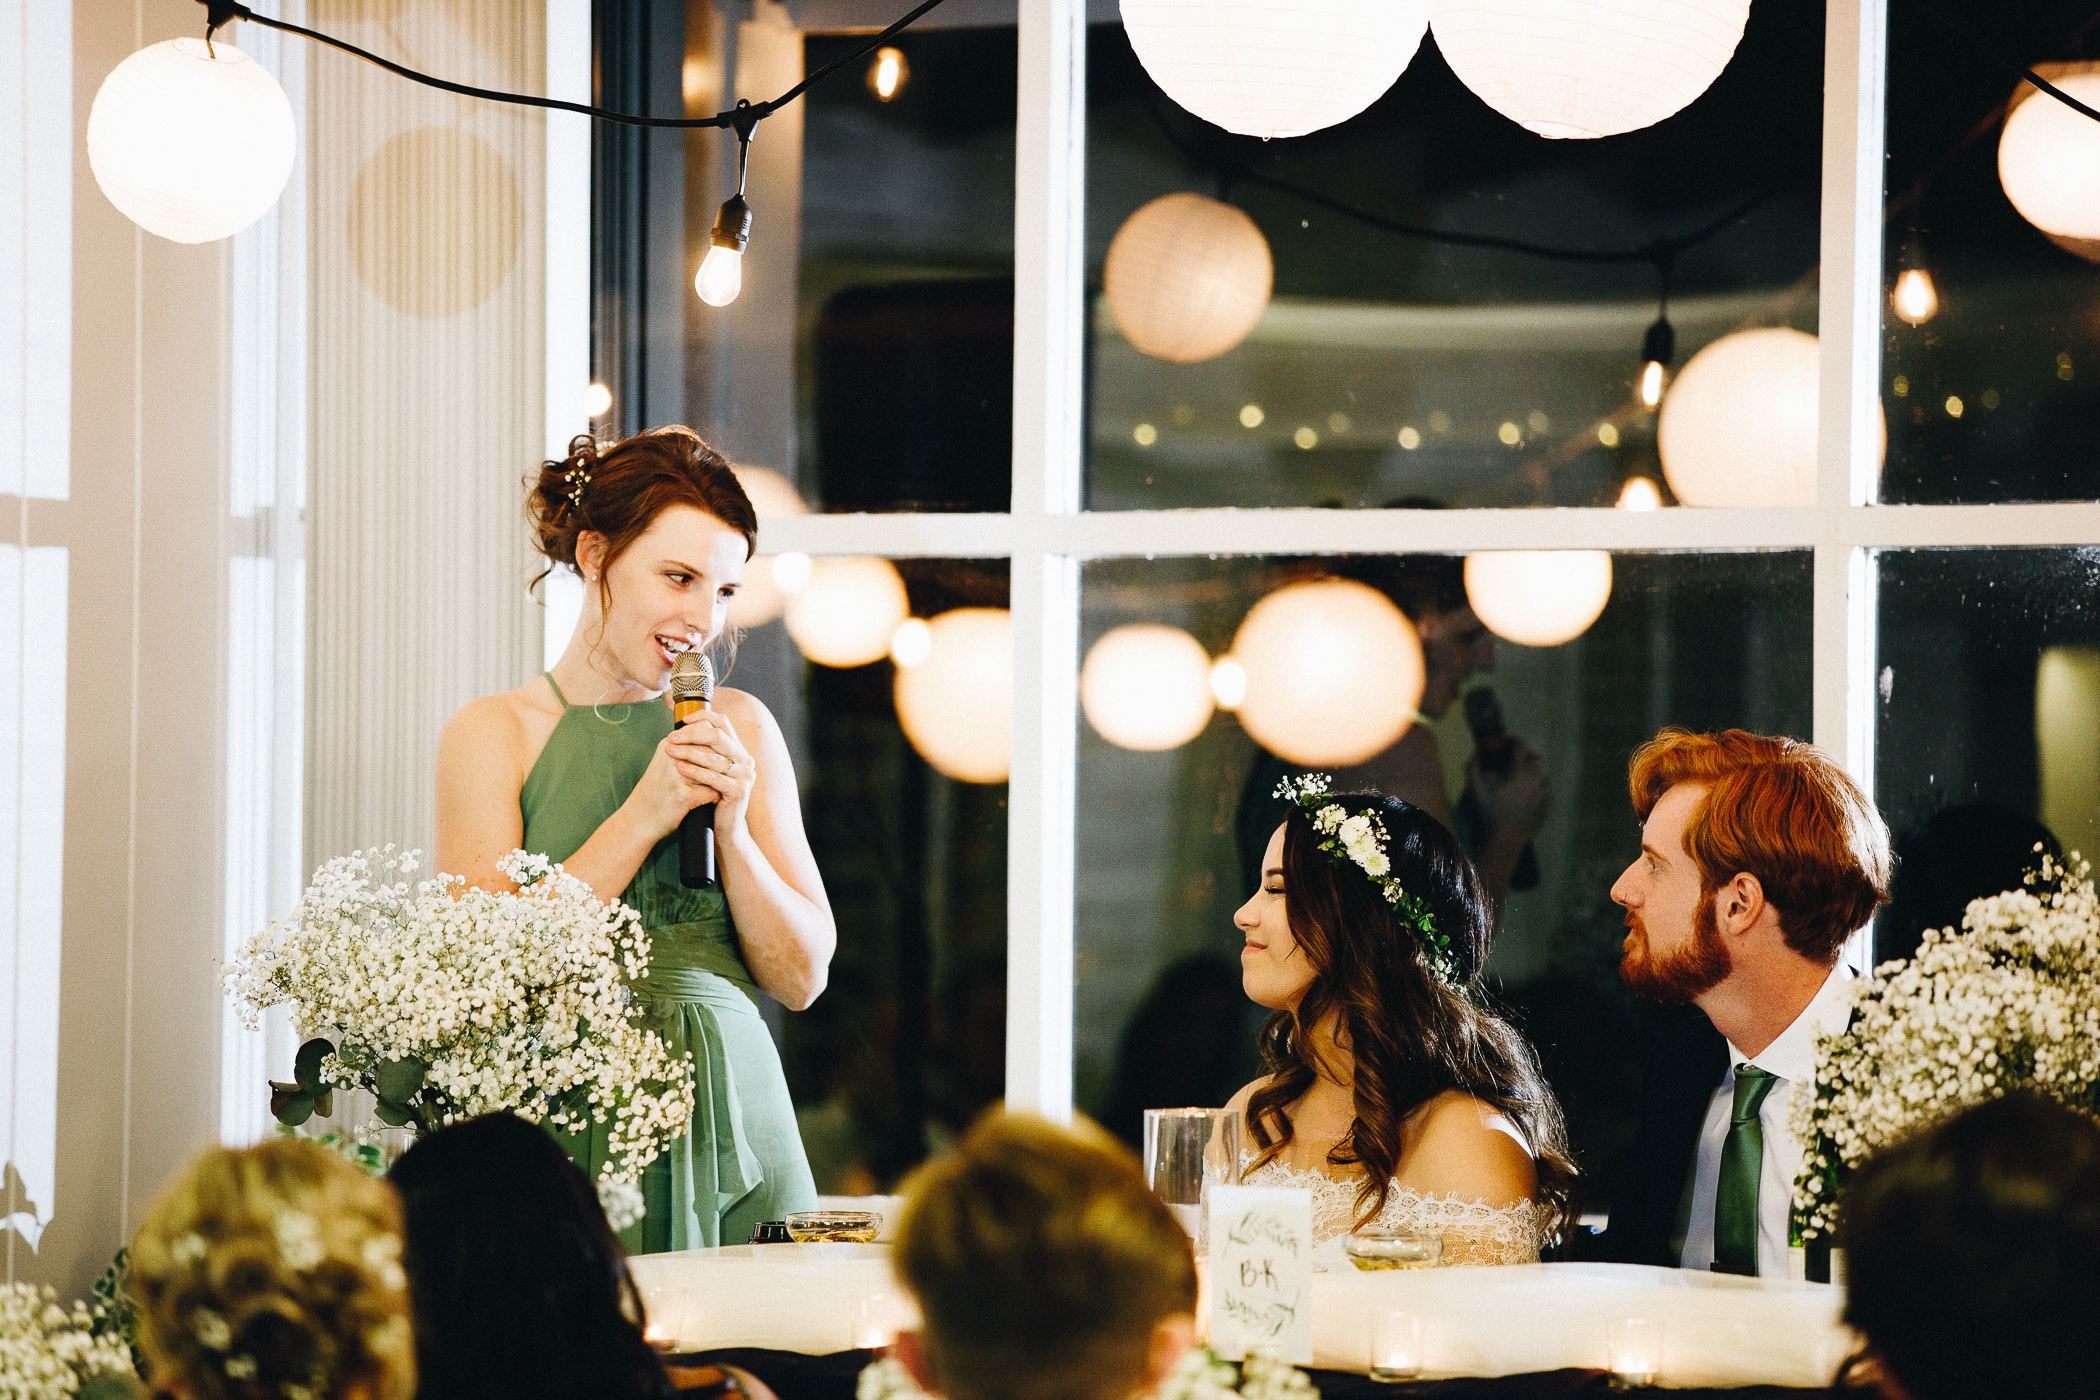 181104-Luxium-Weddings-Arizona-@matt__Le-Brandon-Kariana-Phoenix-Valley-Garden-Center-1133.jpg